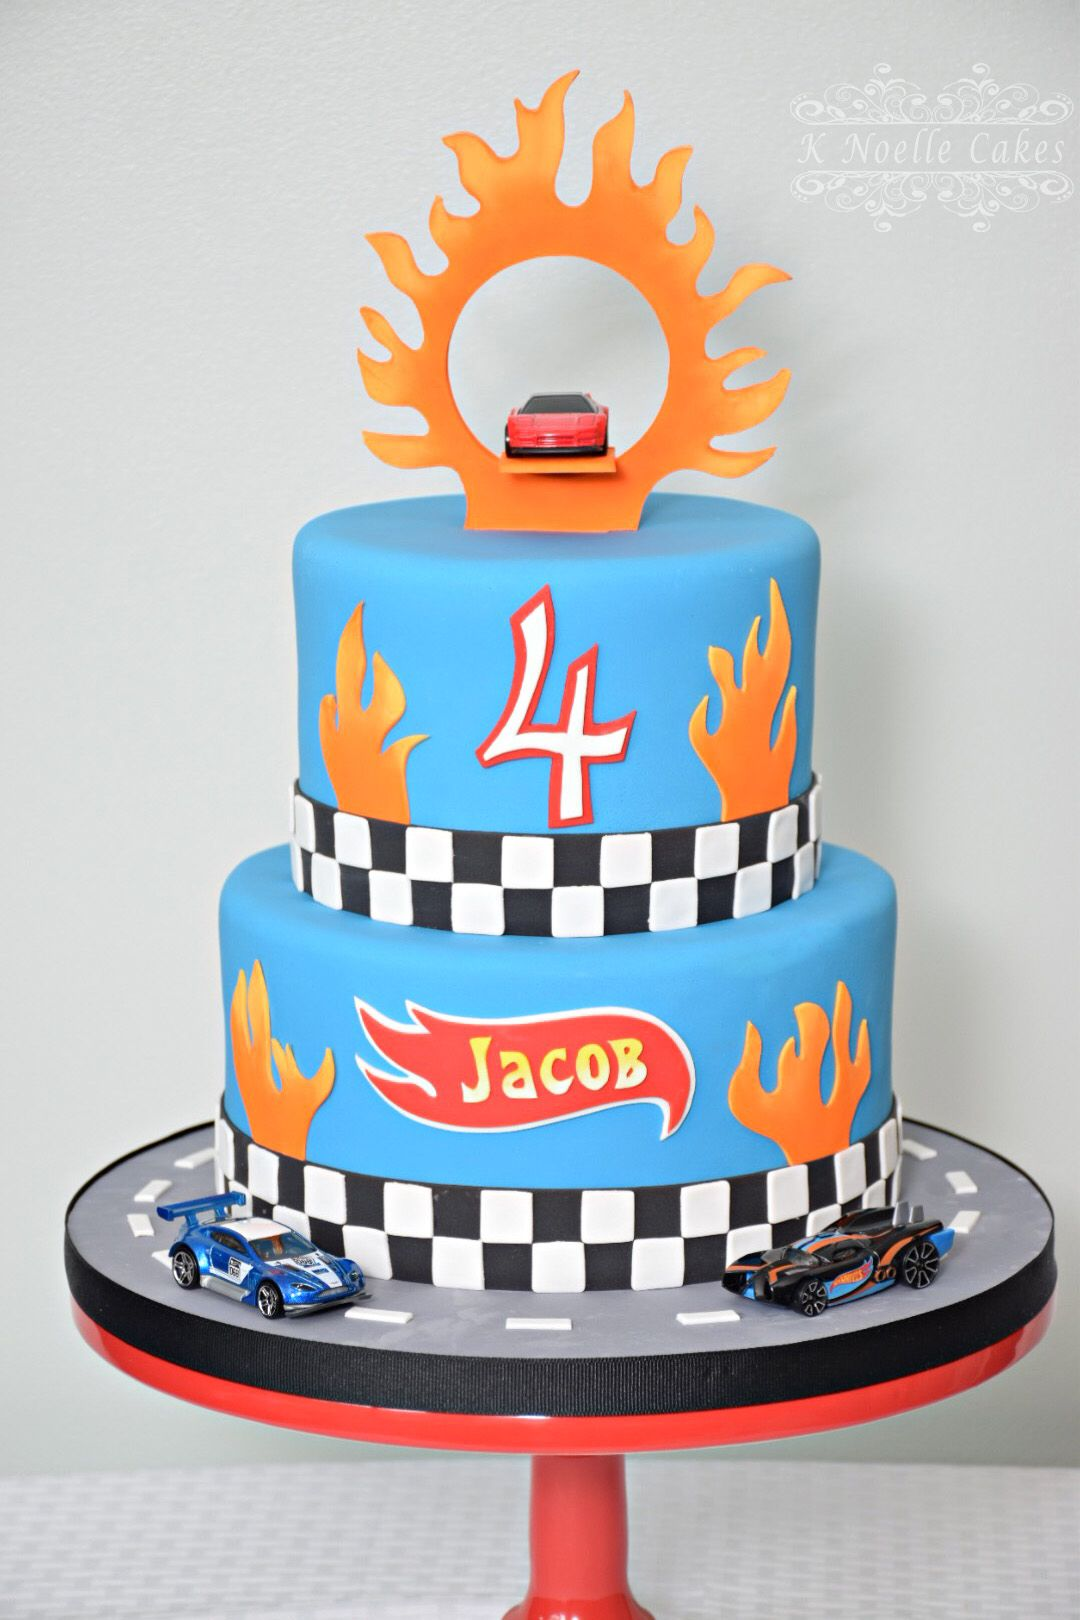 Wondrous Hot Wheels Theme Birthday Cake By K Noelle Cakes Torta De Hot Funny Birthday Cards Online Alyptdamsfinfo